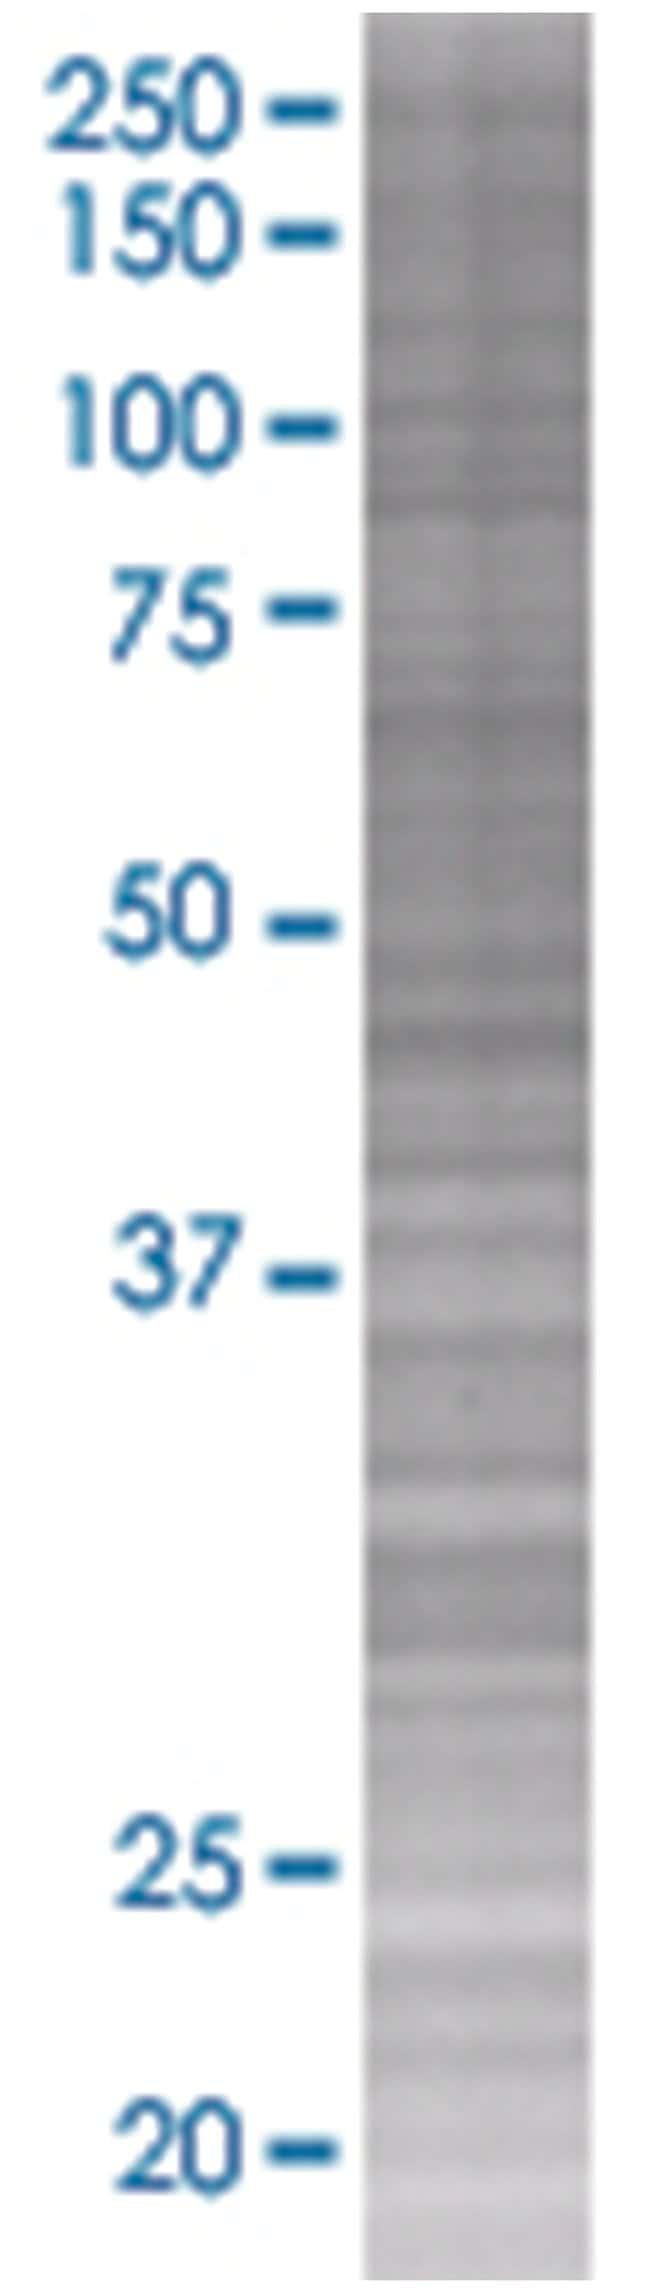 CLEC7A 293T Cell Overexpression Lysate 2 (Denatured), Abnova 100µL:Life